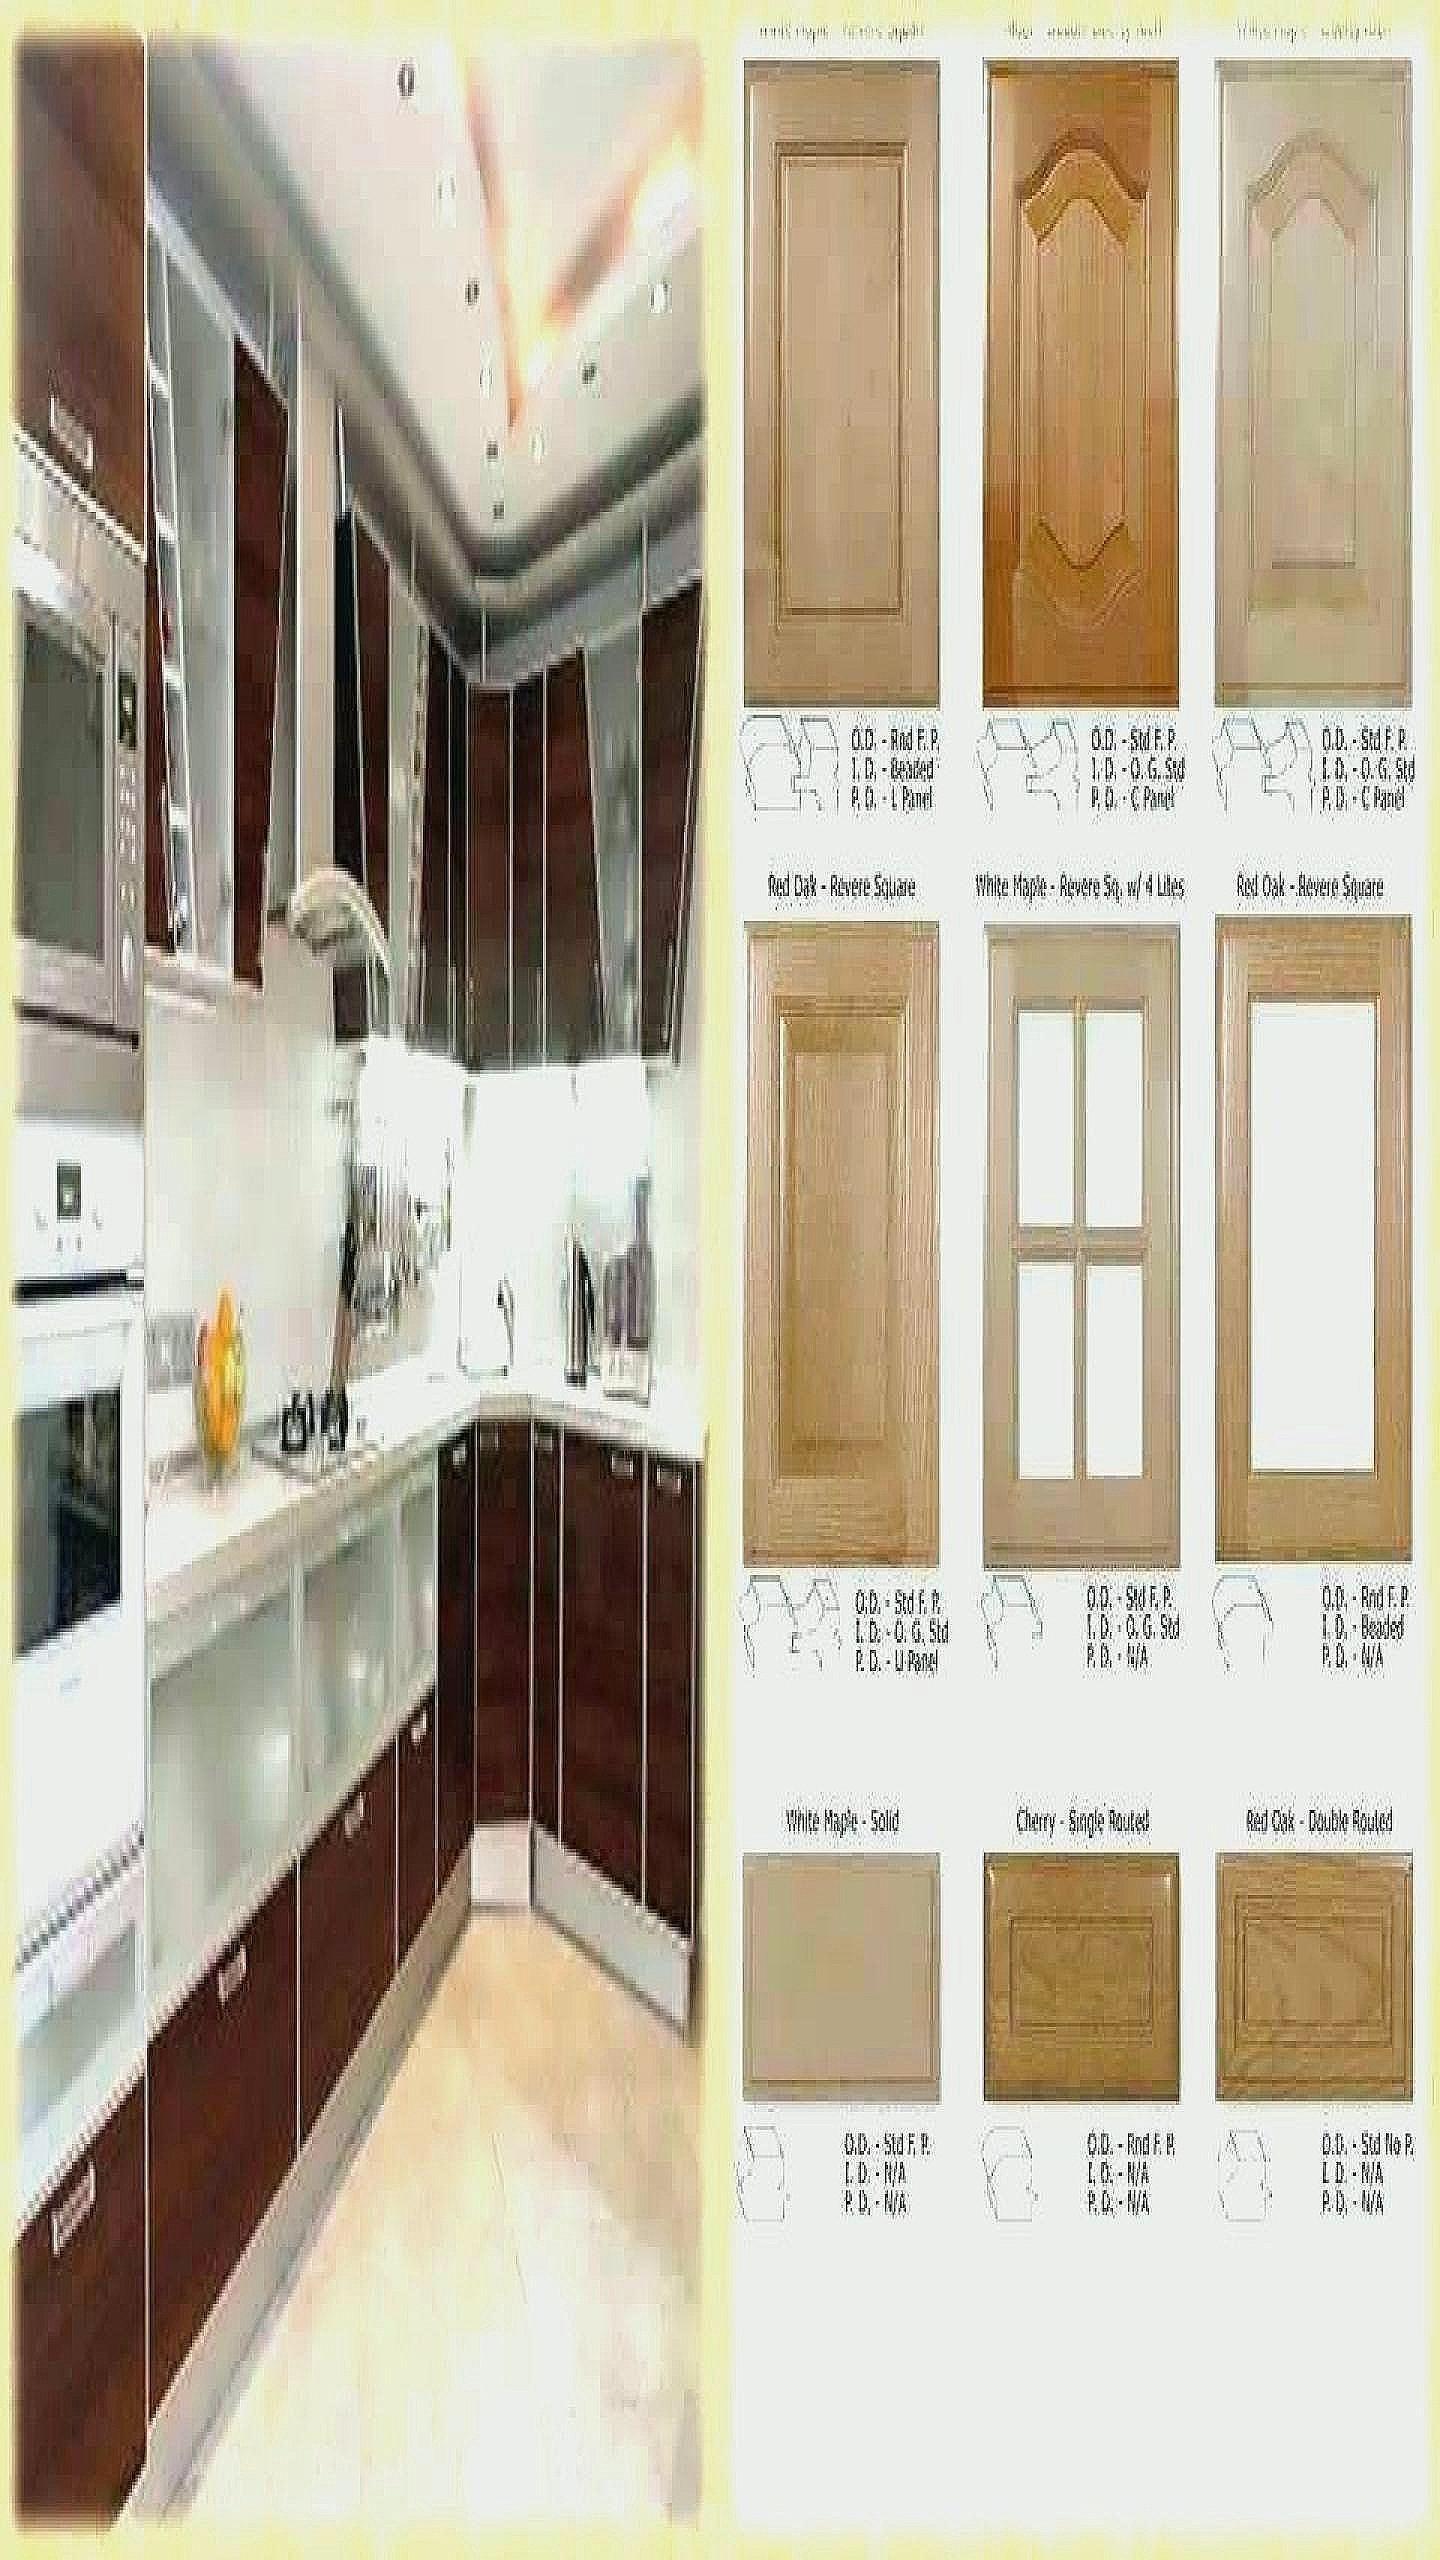 Kitchen Cabinet Door Design Photos Cool Fresh Kitchen Cabinet Doors Interior Design In 12 5044 5